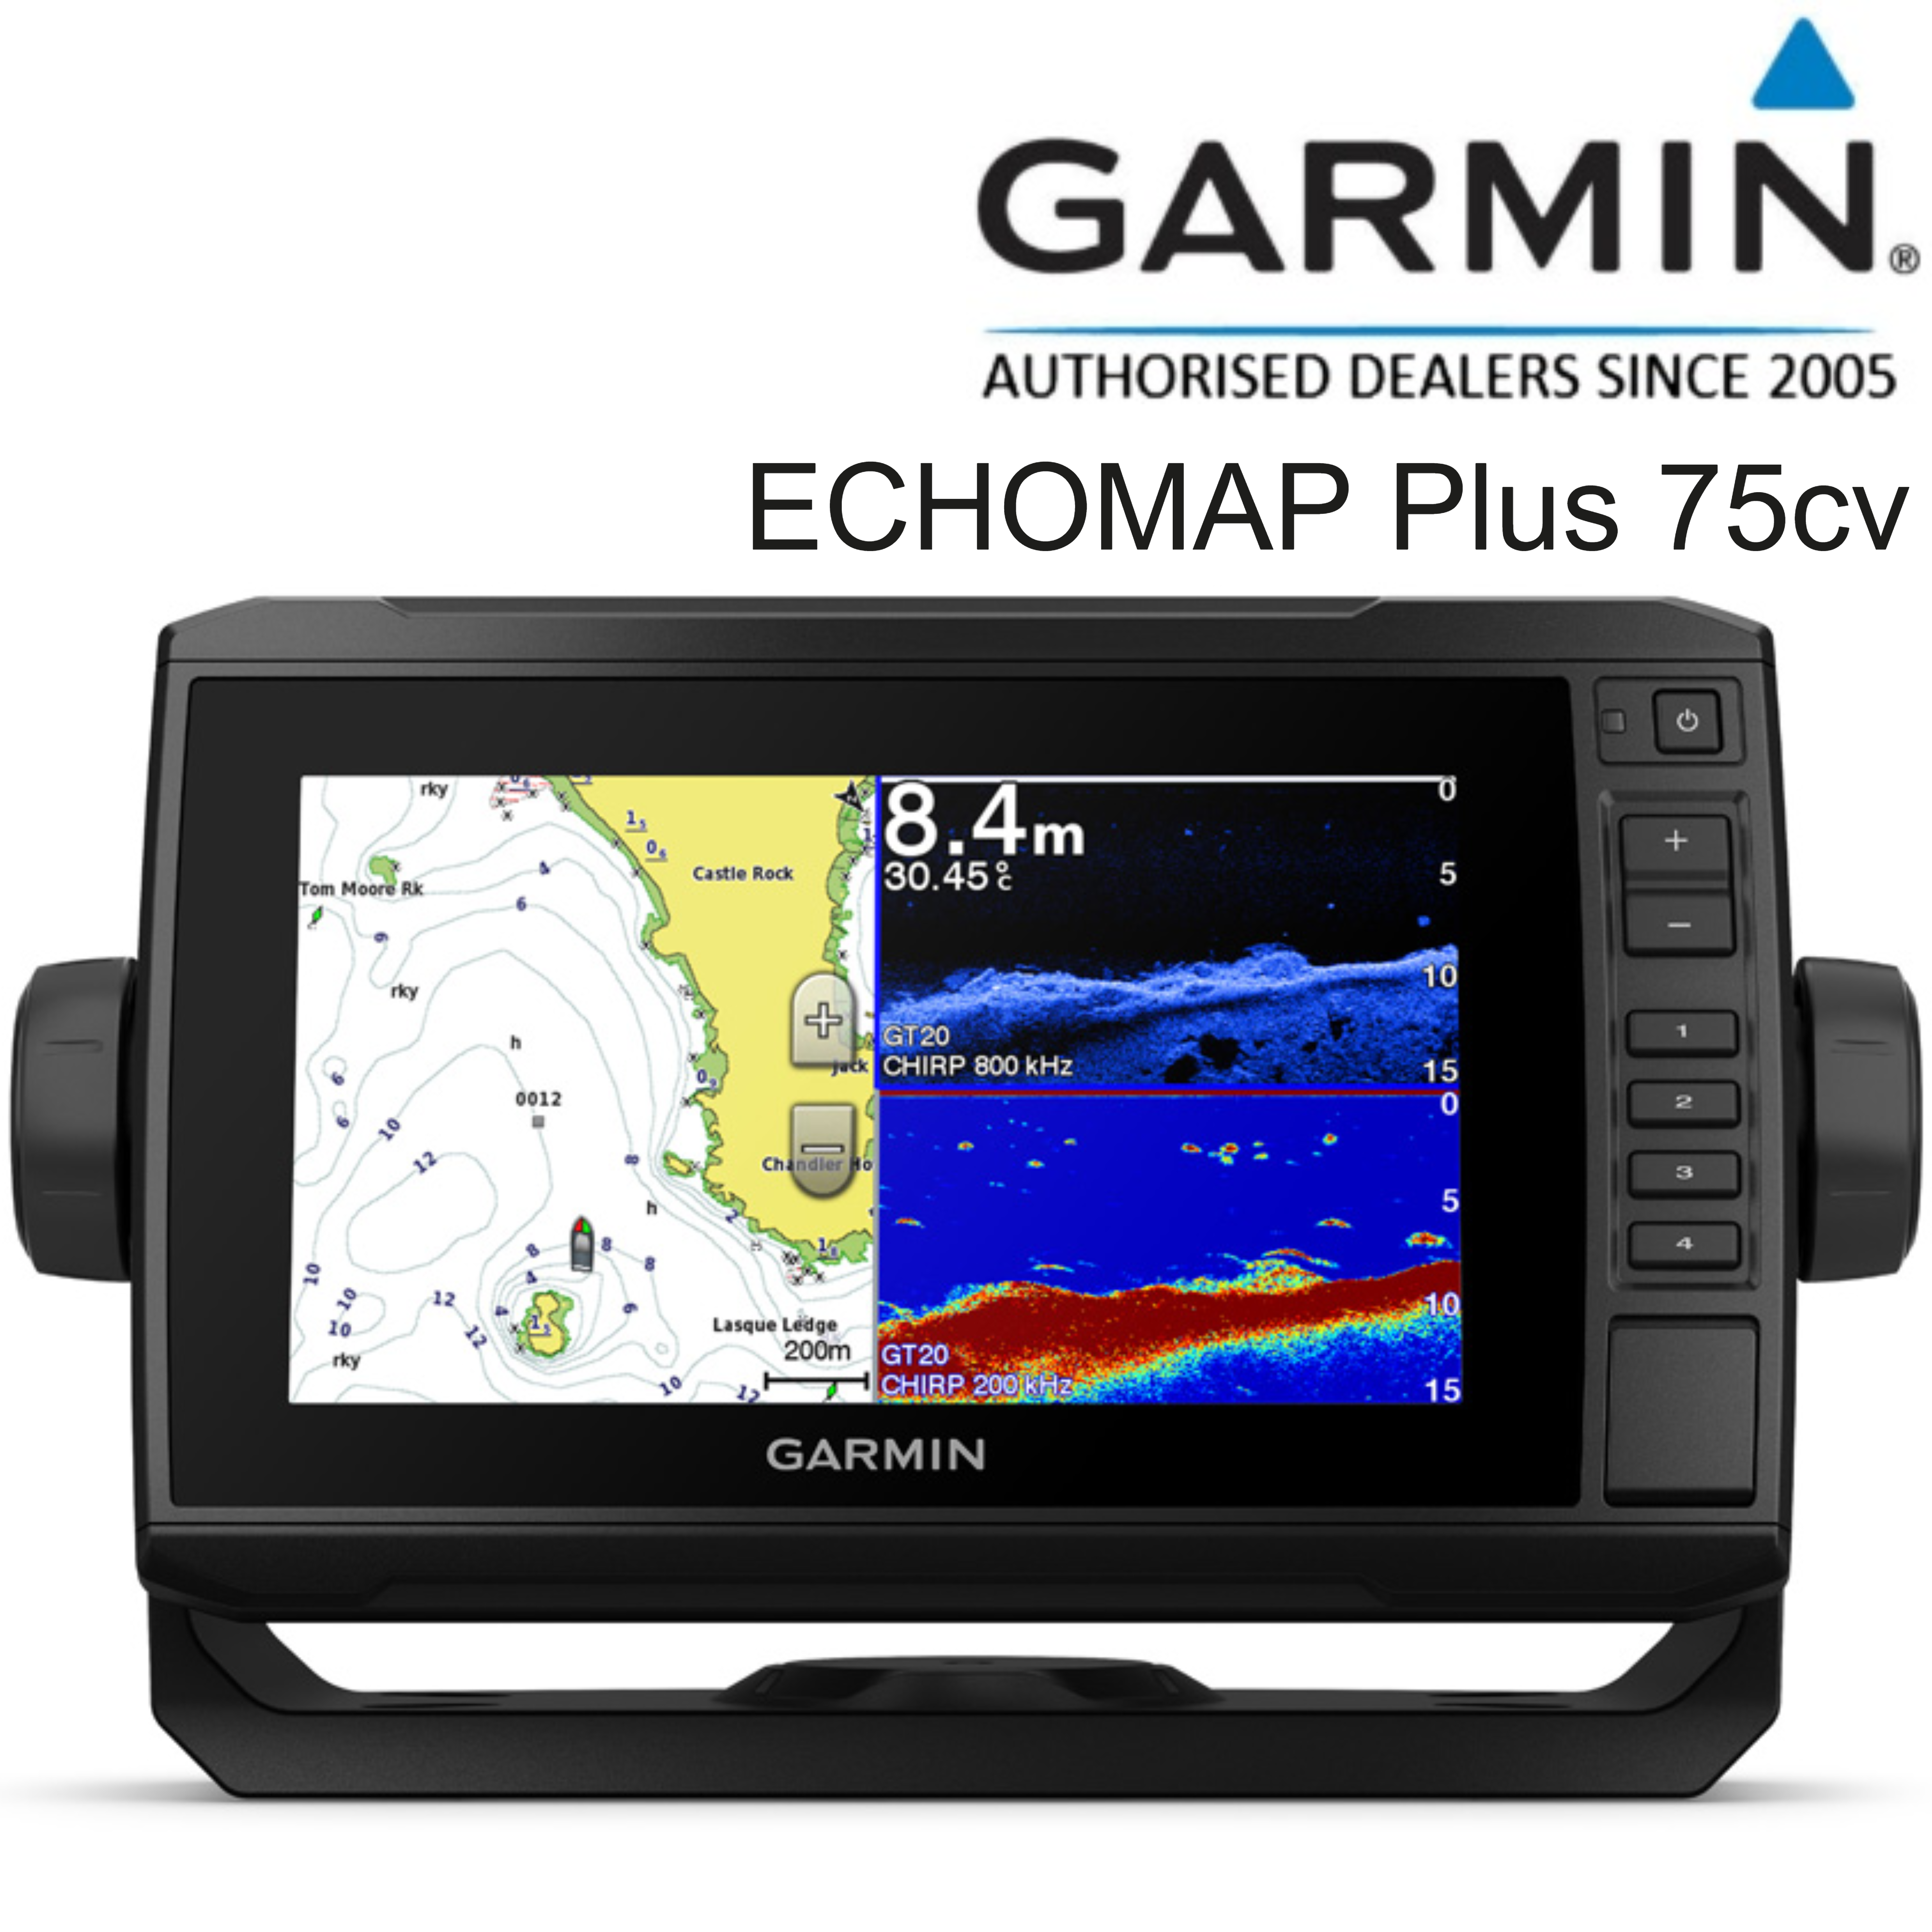 "Garmin ECHOMAP Plus 75cv-7"" CHIRP Sonar Preloaded UK/Ire G2 Chart Exc.Transducer"